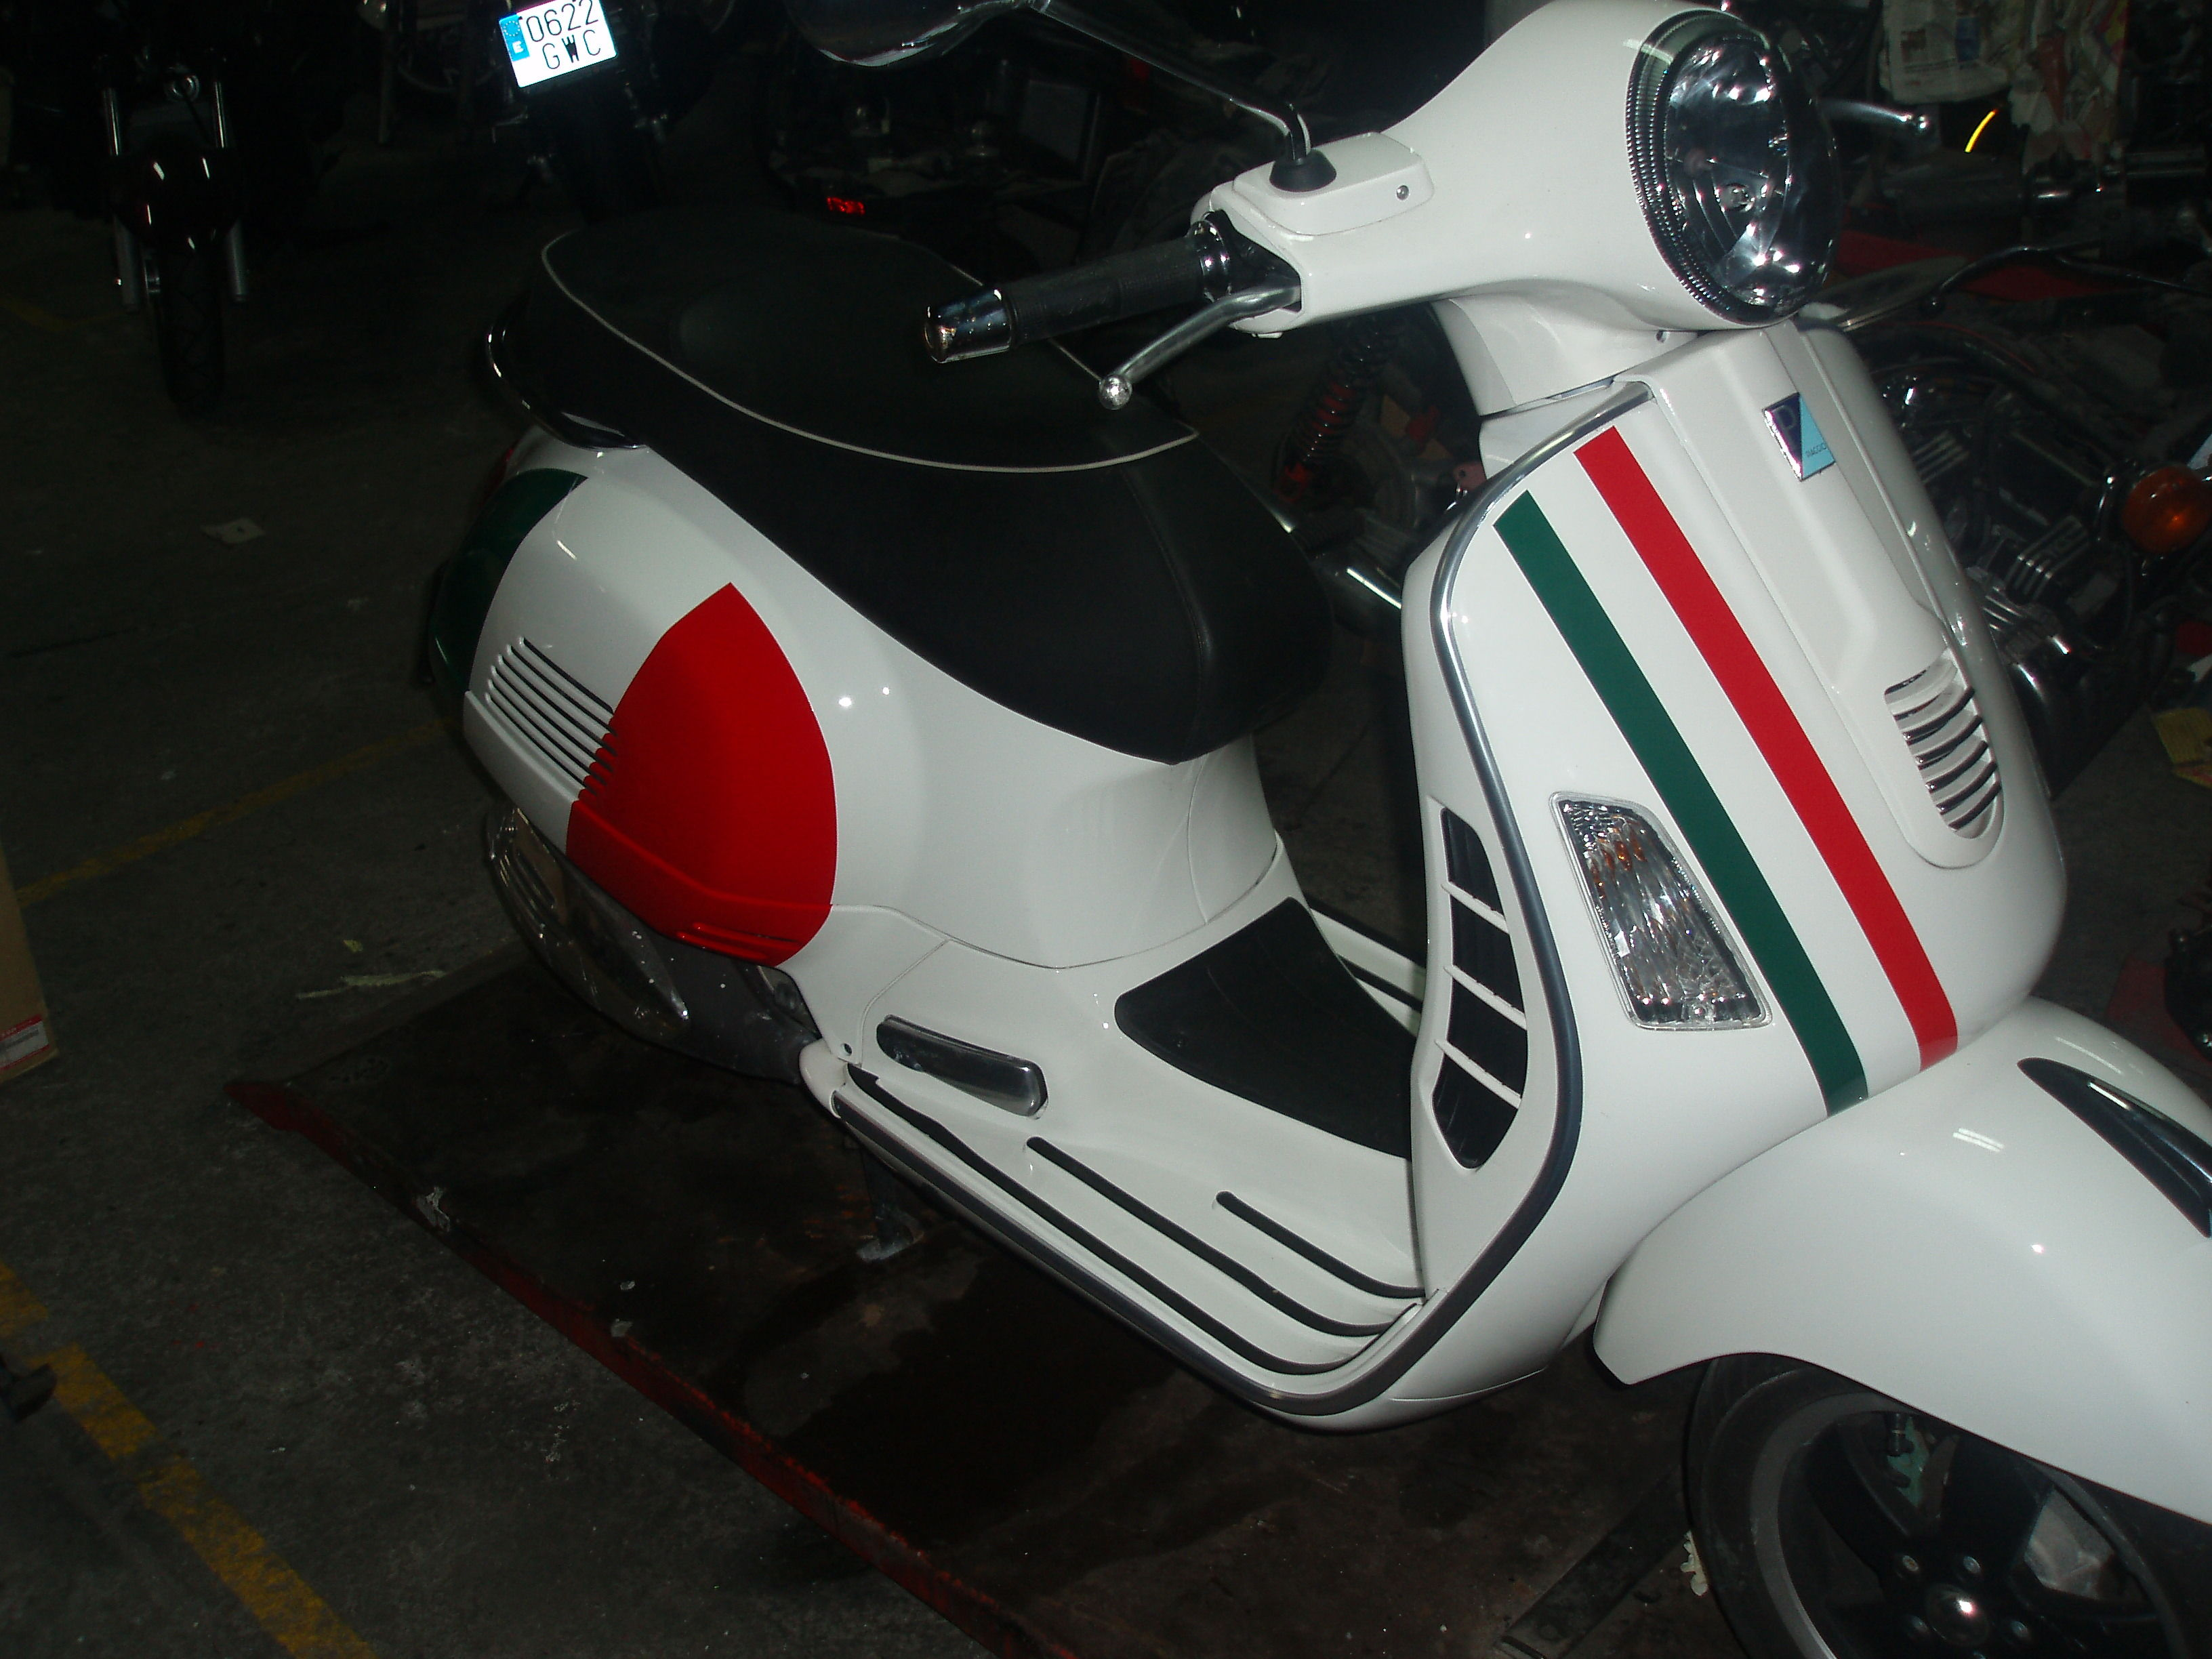 Foto 3 de Motos en Vigo | Moto 2